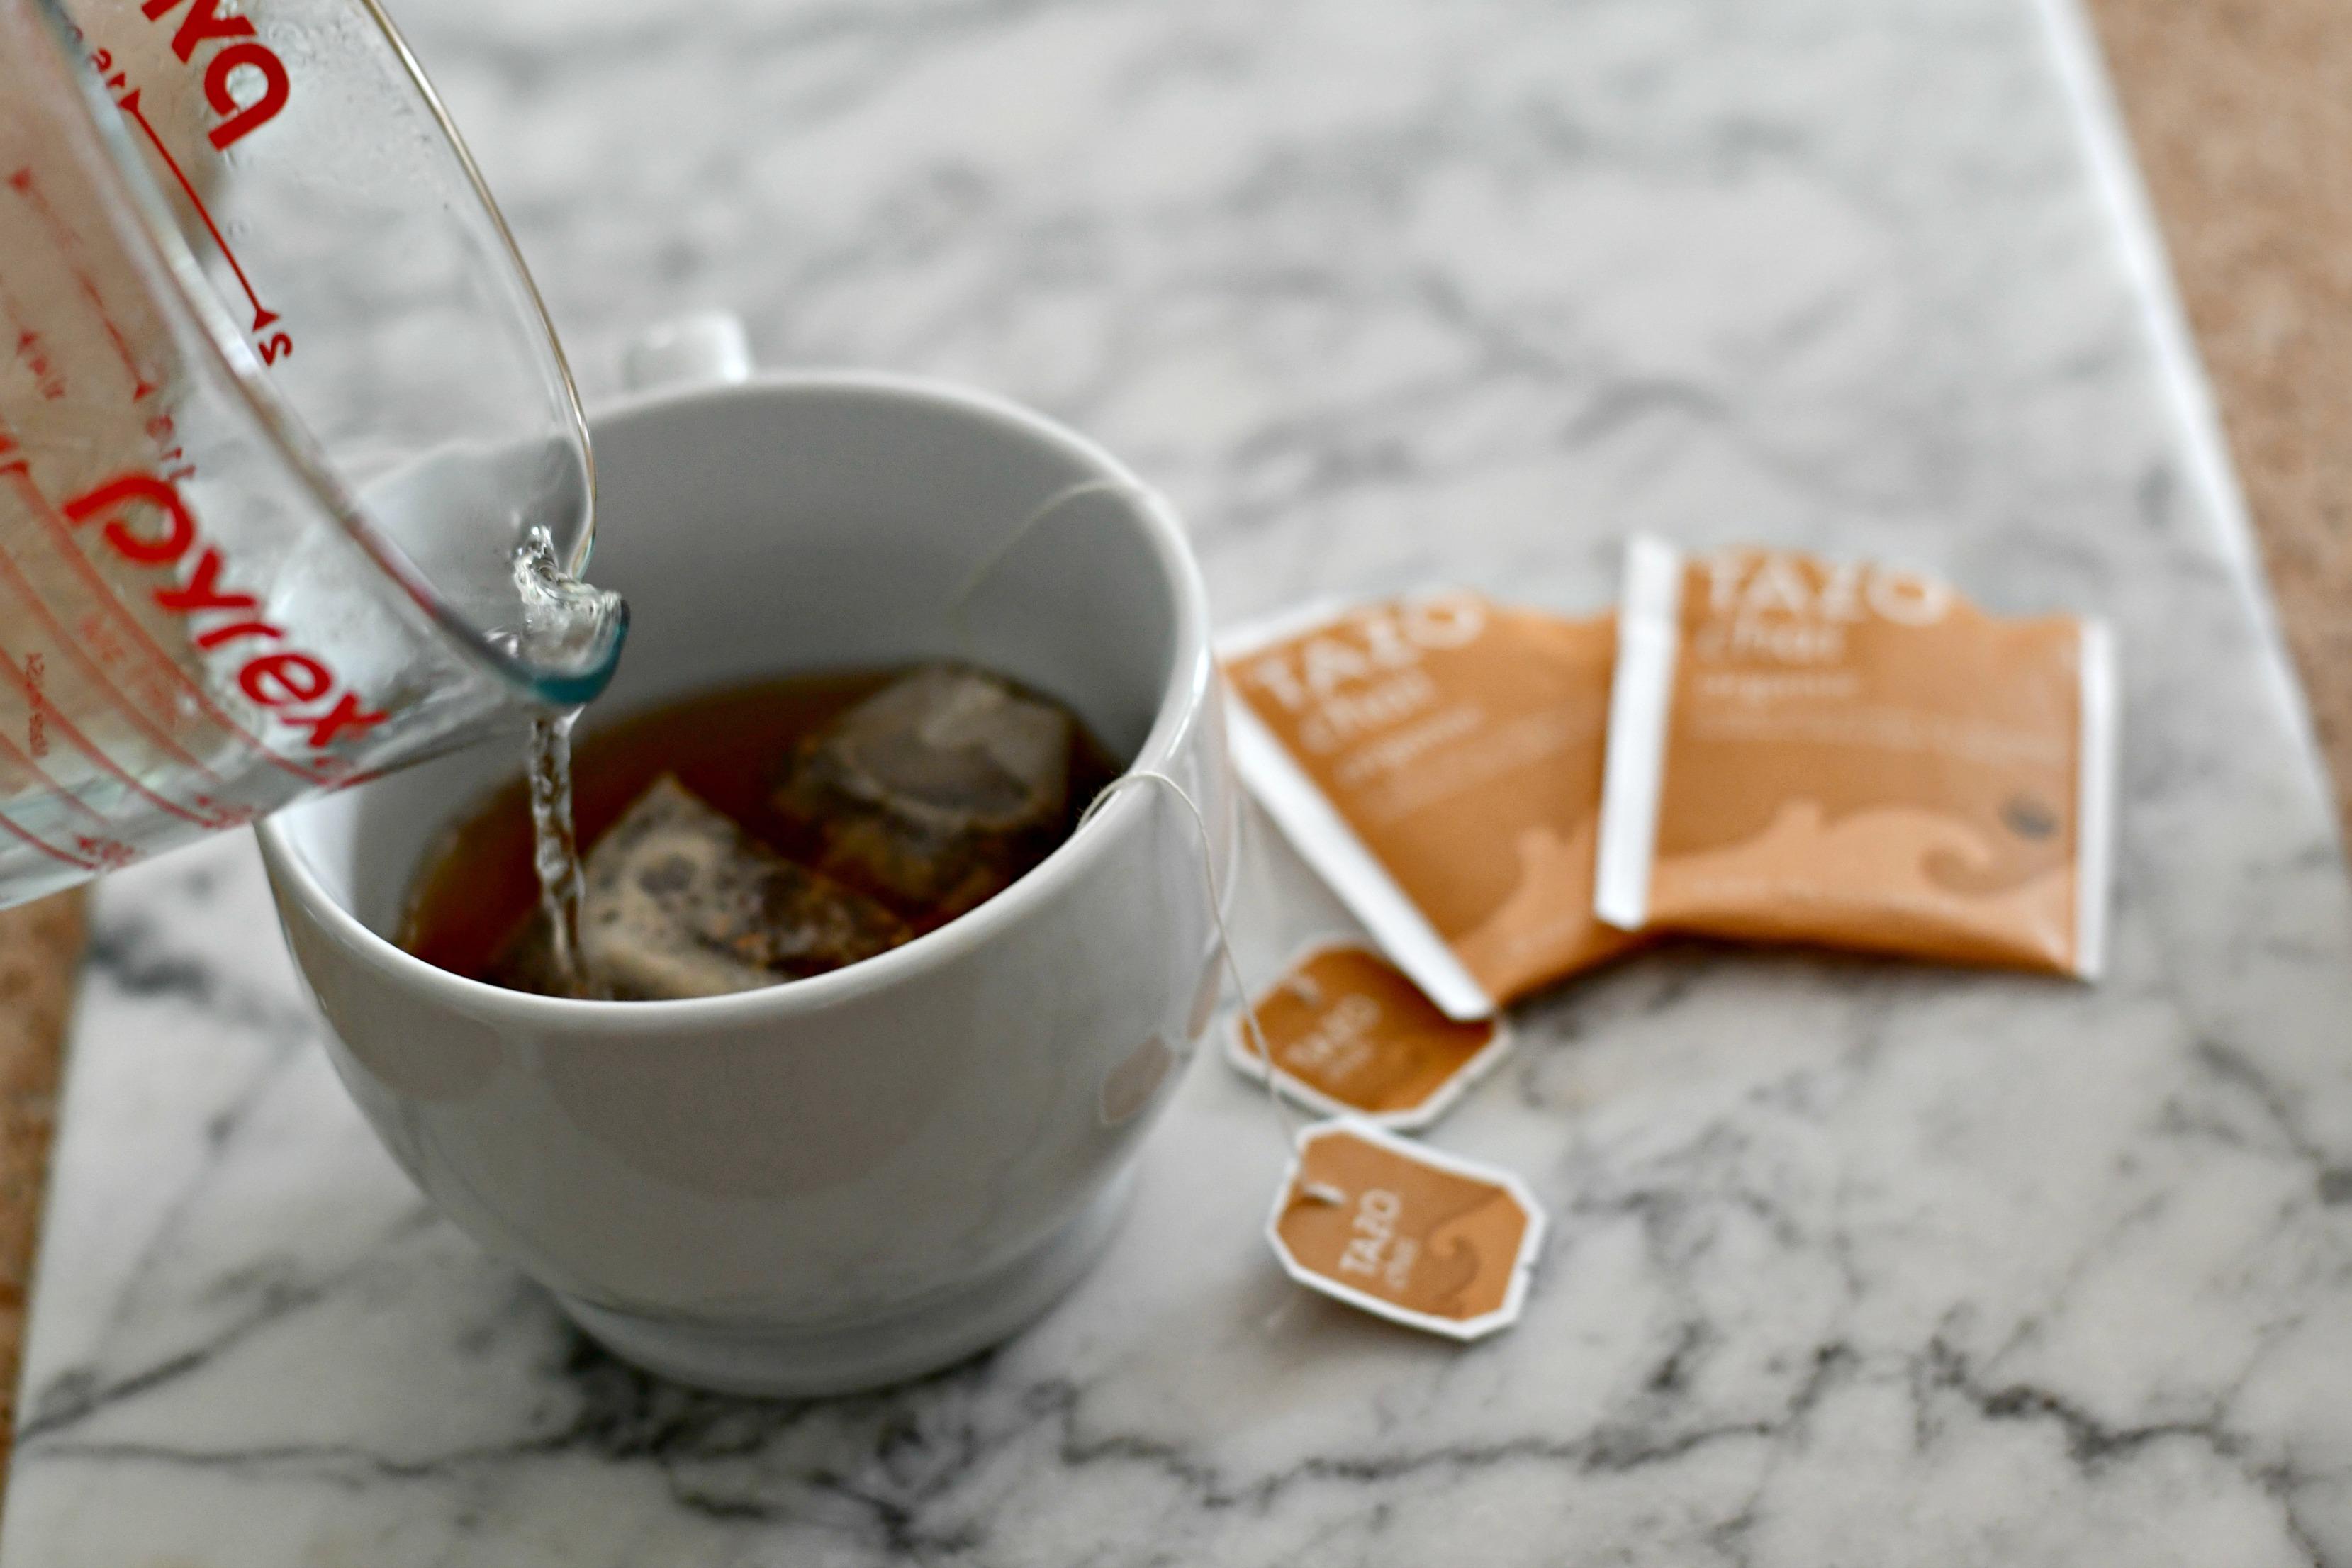 Pouring the diy starbucks chai latte into a mug